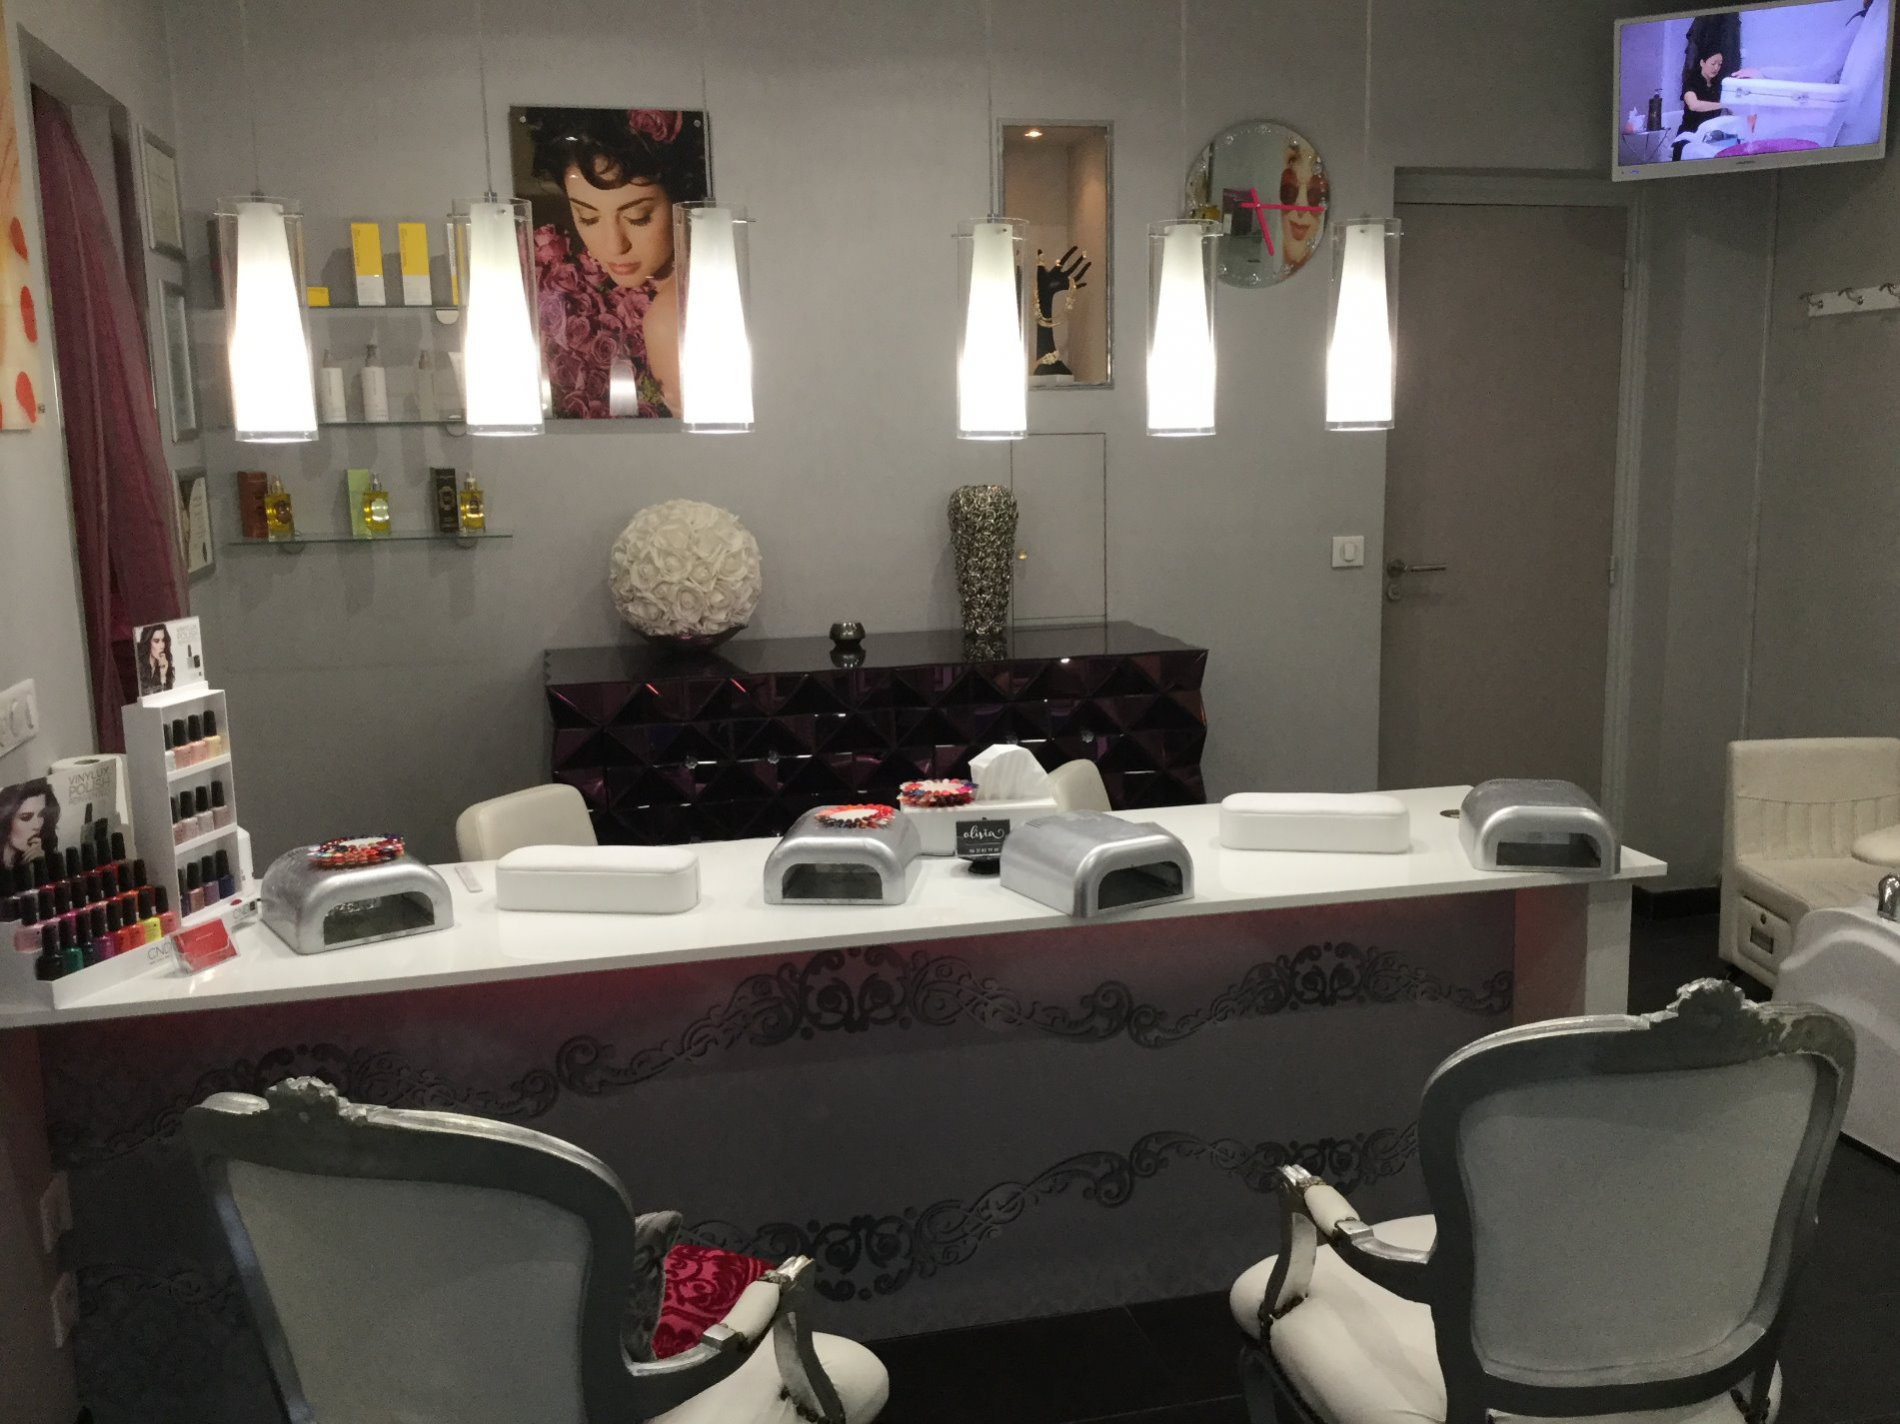 vente immobilier professionnel magasin beaute nice carre d 39 or. Black Bedroom Furniture Sets. Home Design Ideas